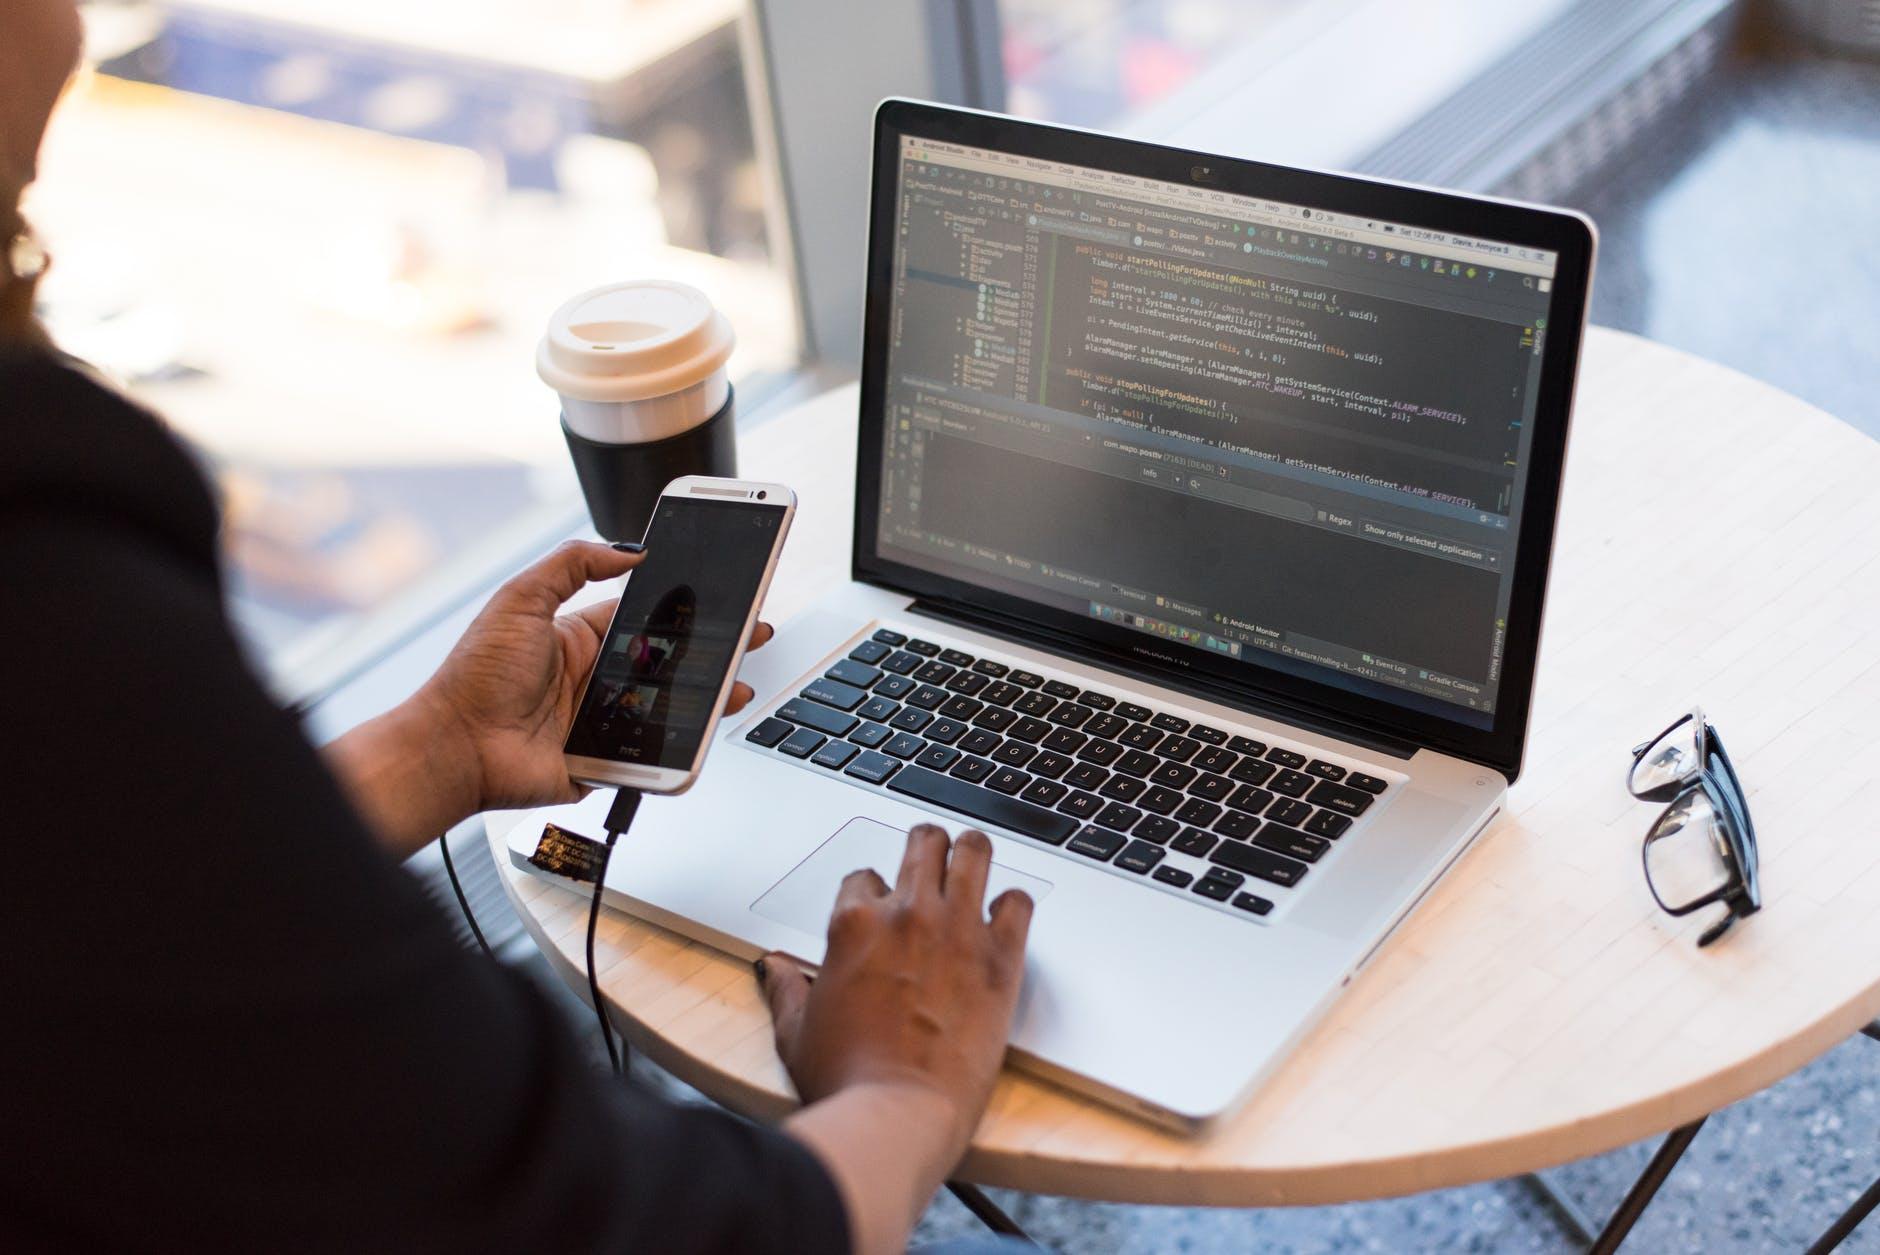 App Development With JavaScript: Hybrid Or Native?